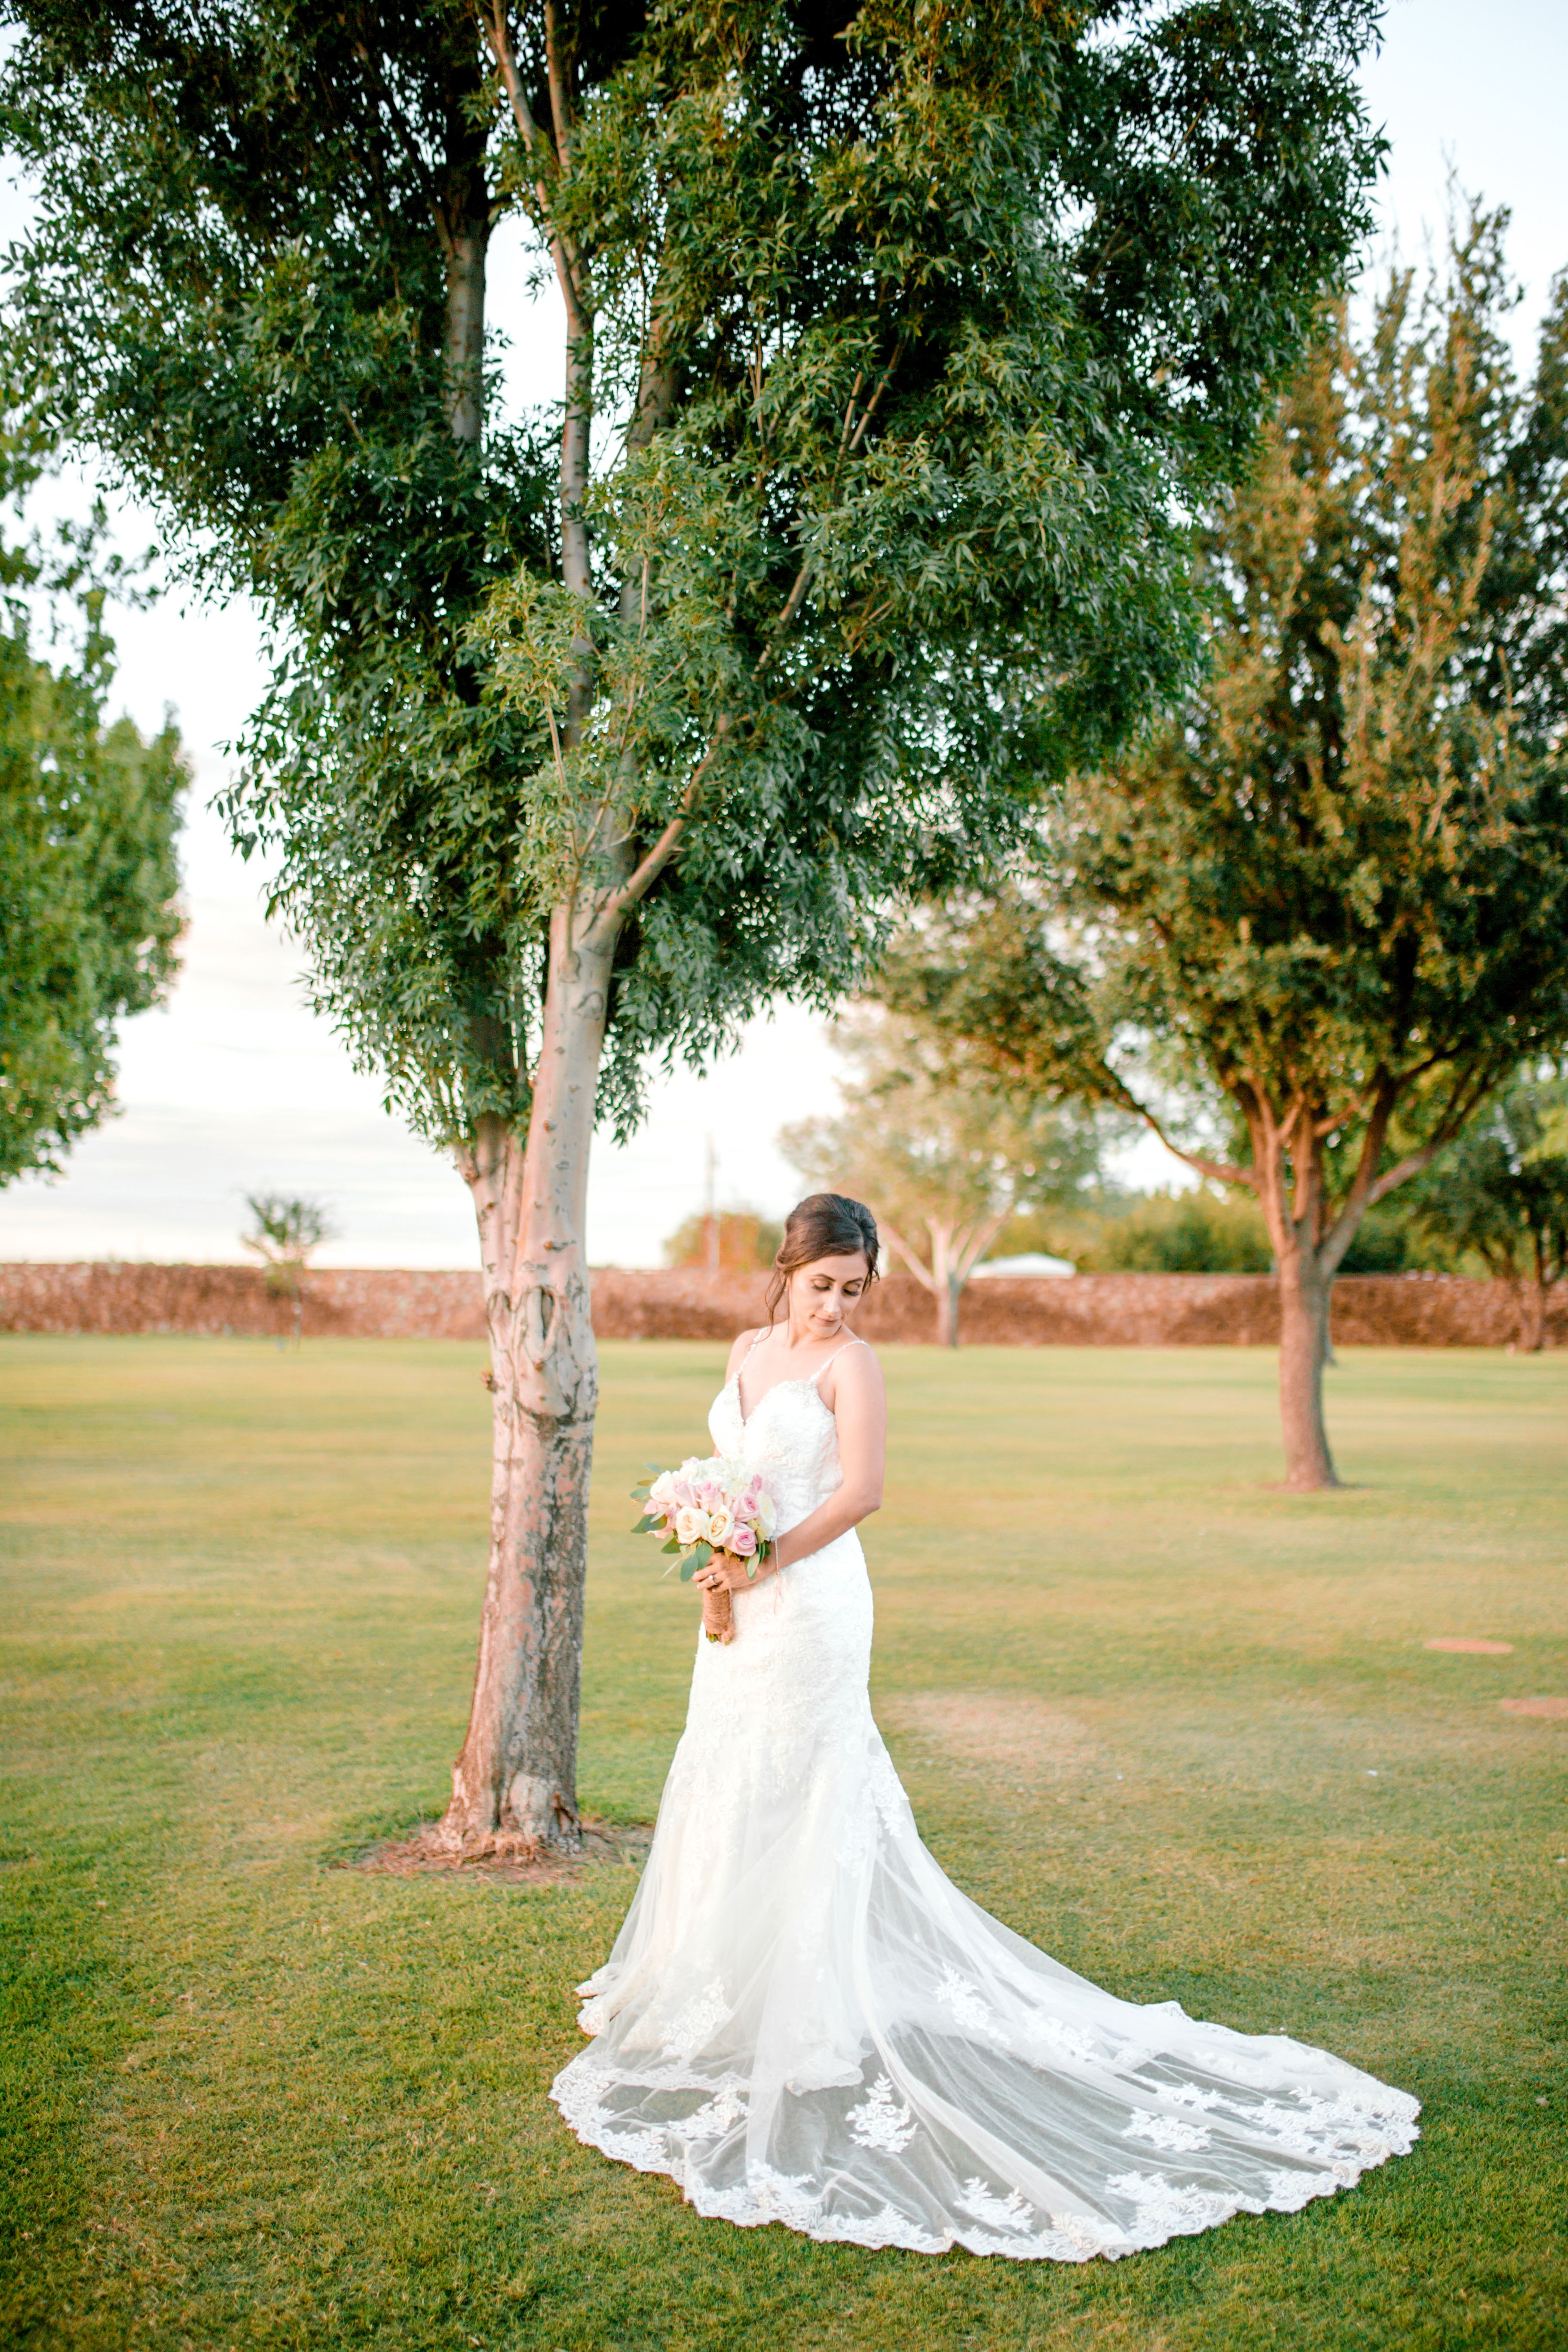 Matt Nancy La Vina Winery El Paso Wedding Sparrow Gold Photography Wedding Sparrow Elopement Photographer Wedding